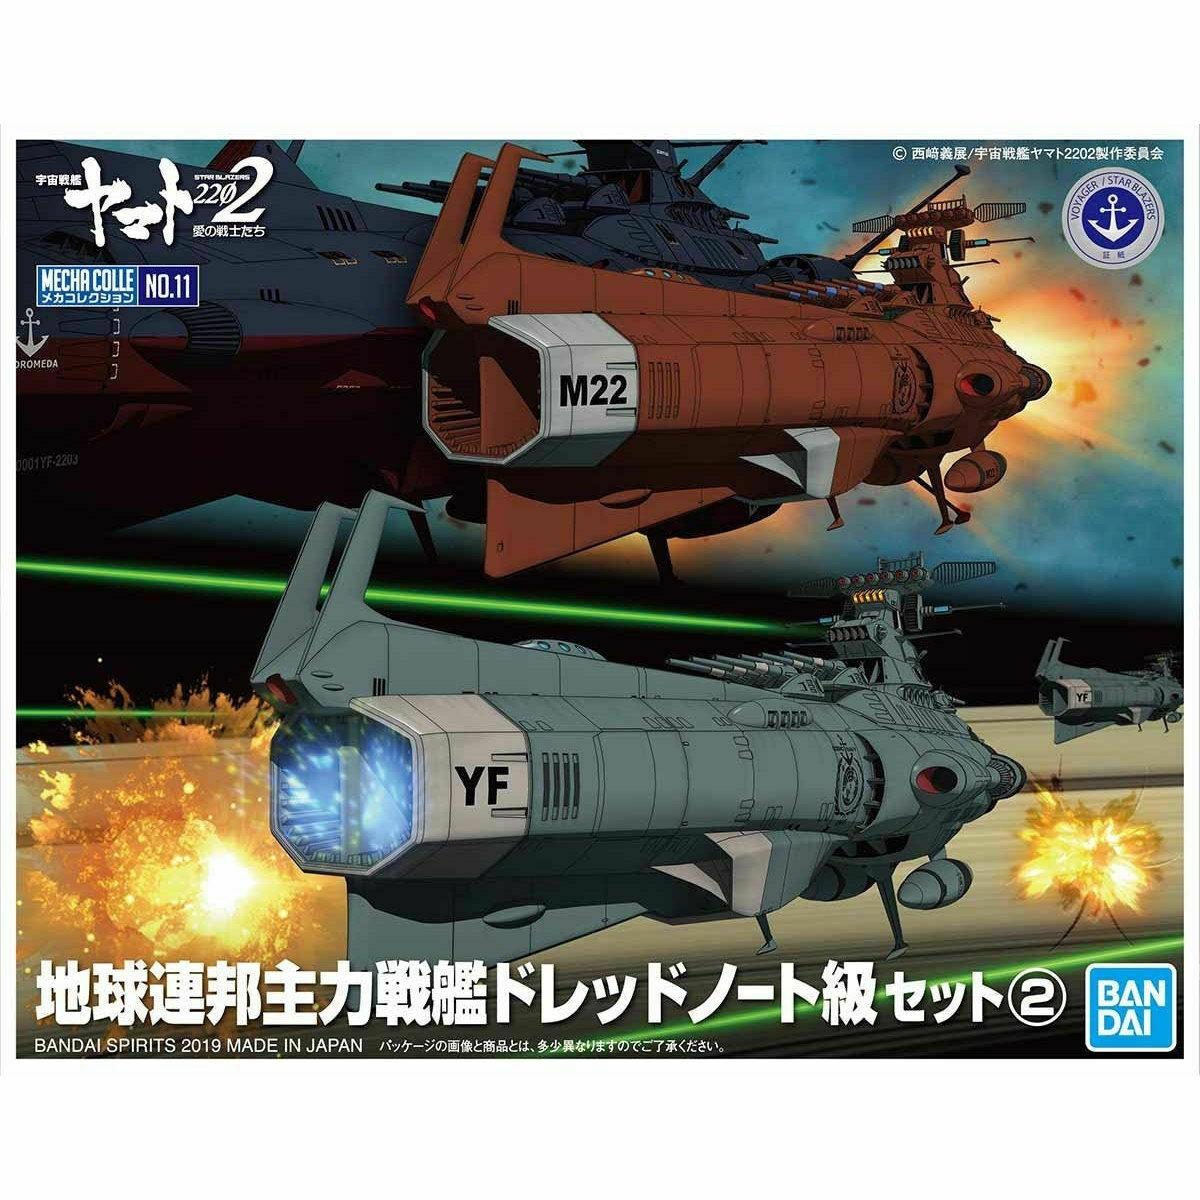 SPACE BATTLESHIP YAMATO 2202 MECHA COLLE No.11 - U.N.F.C D-1 SET 2 - PLASTIC MODEL KIT